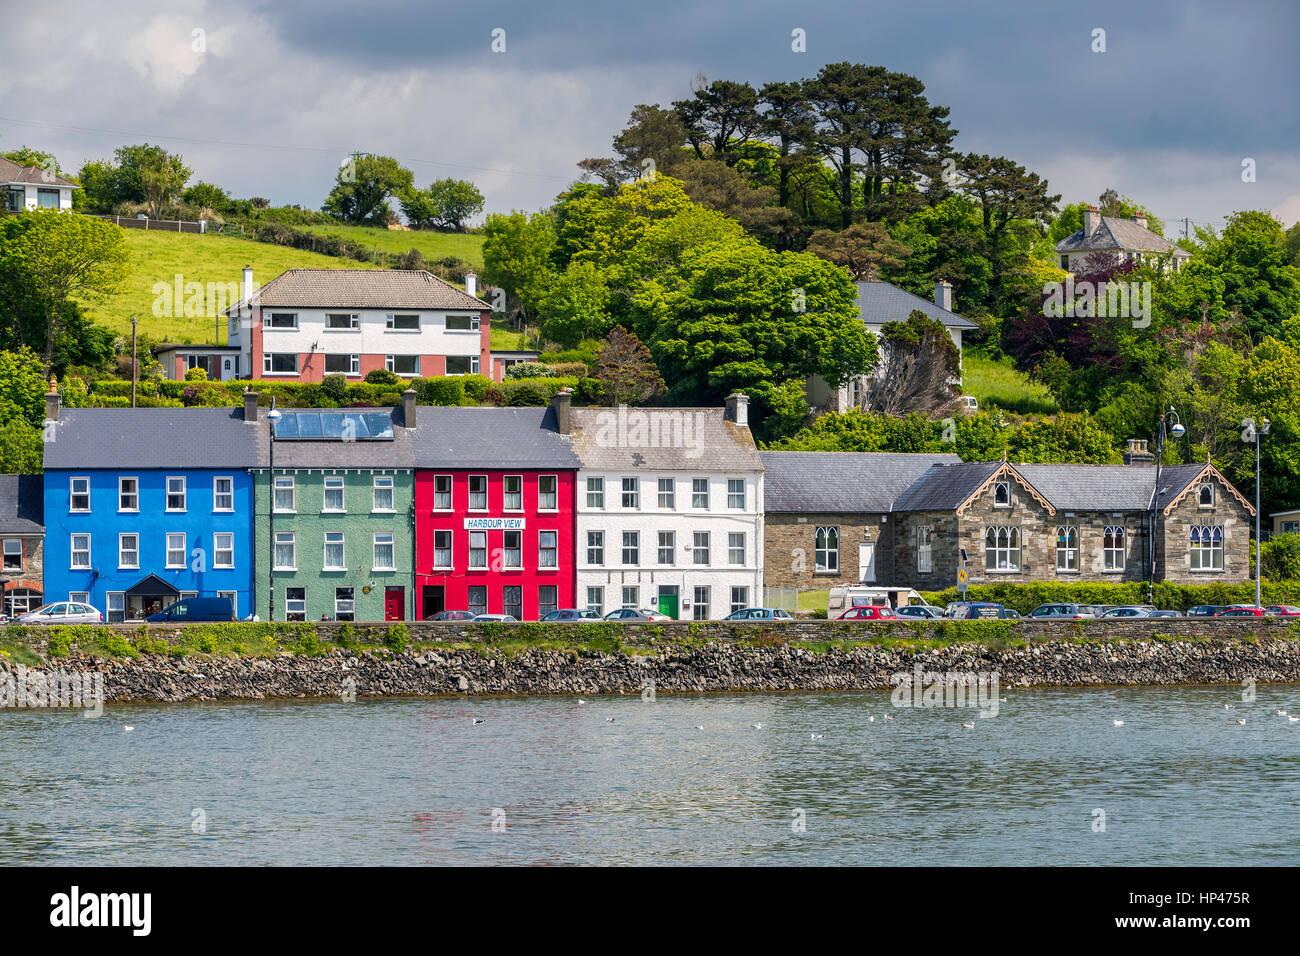 Bantry, West Cork, Wild Atlantic Way, South Western Ireland, Europe. - Stock Image